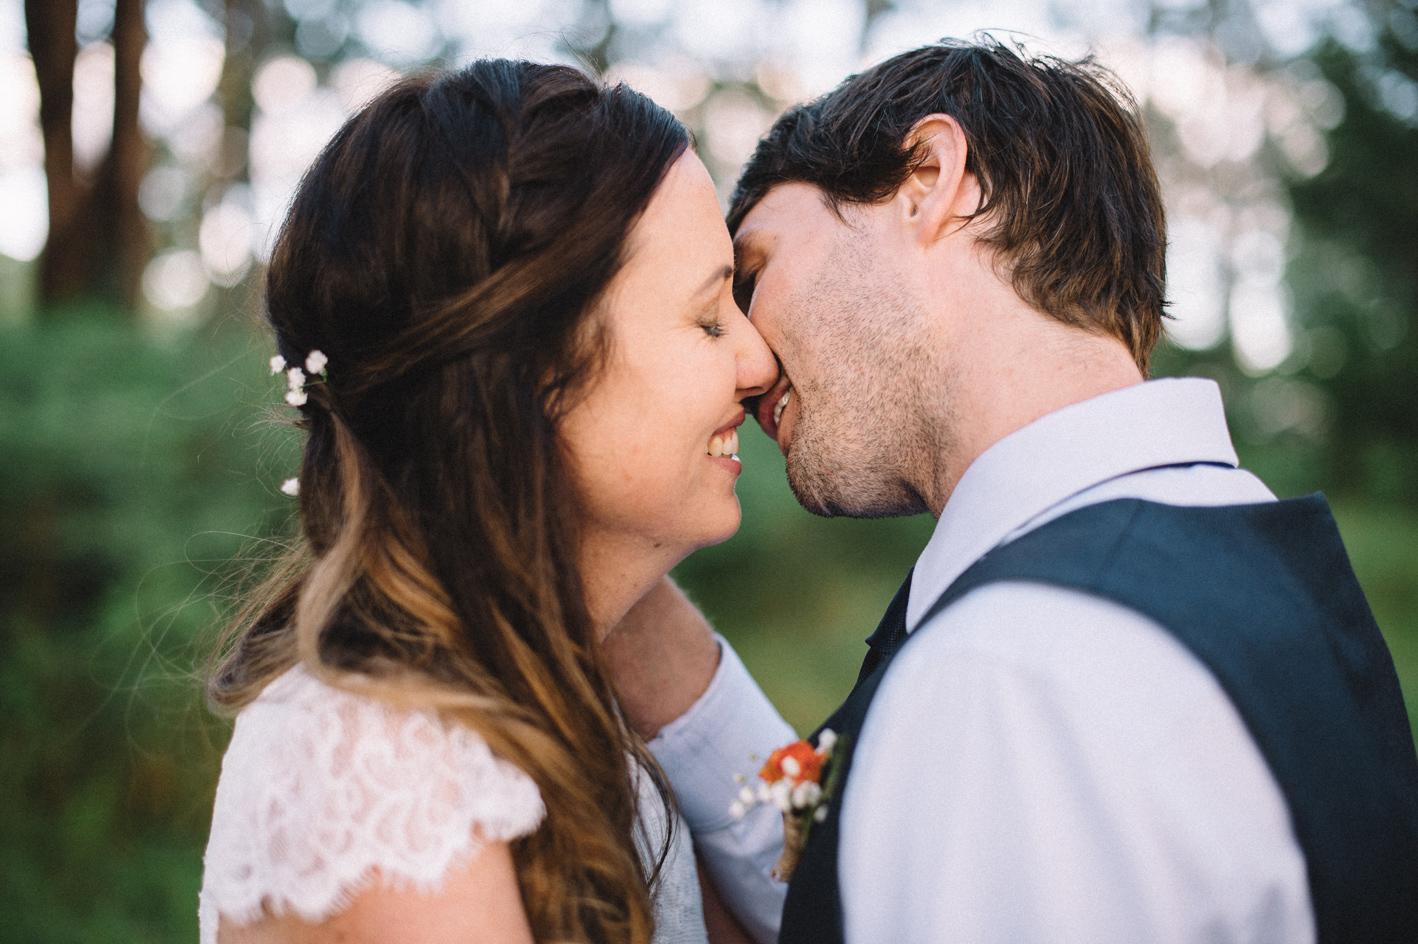 065-michelle-reagan-mount-tamborine-wedding-sophie-baker-photography